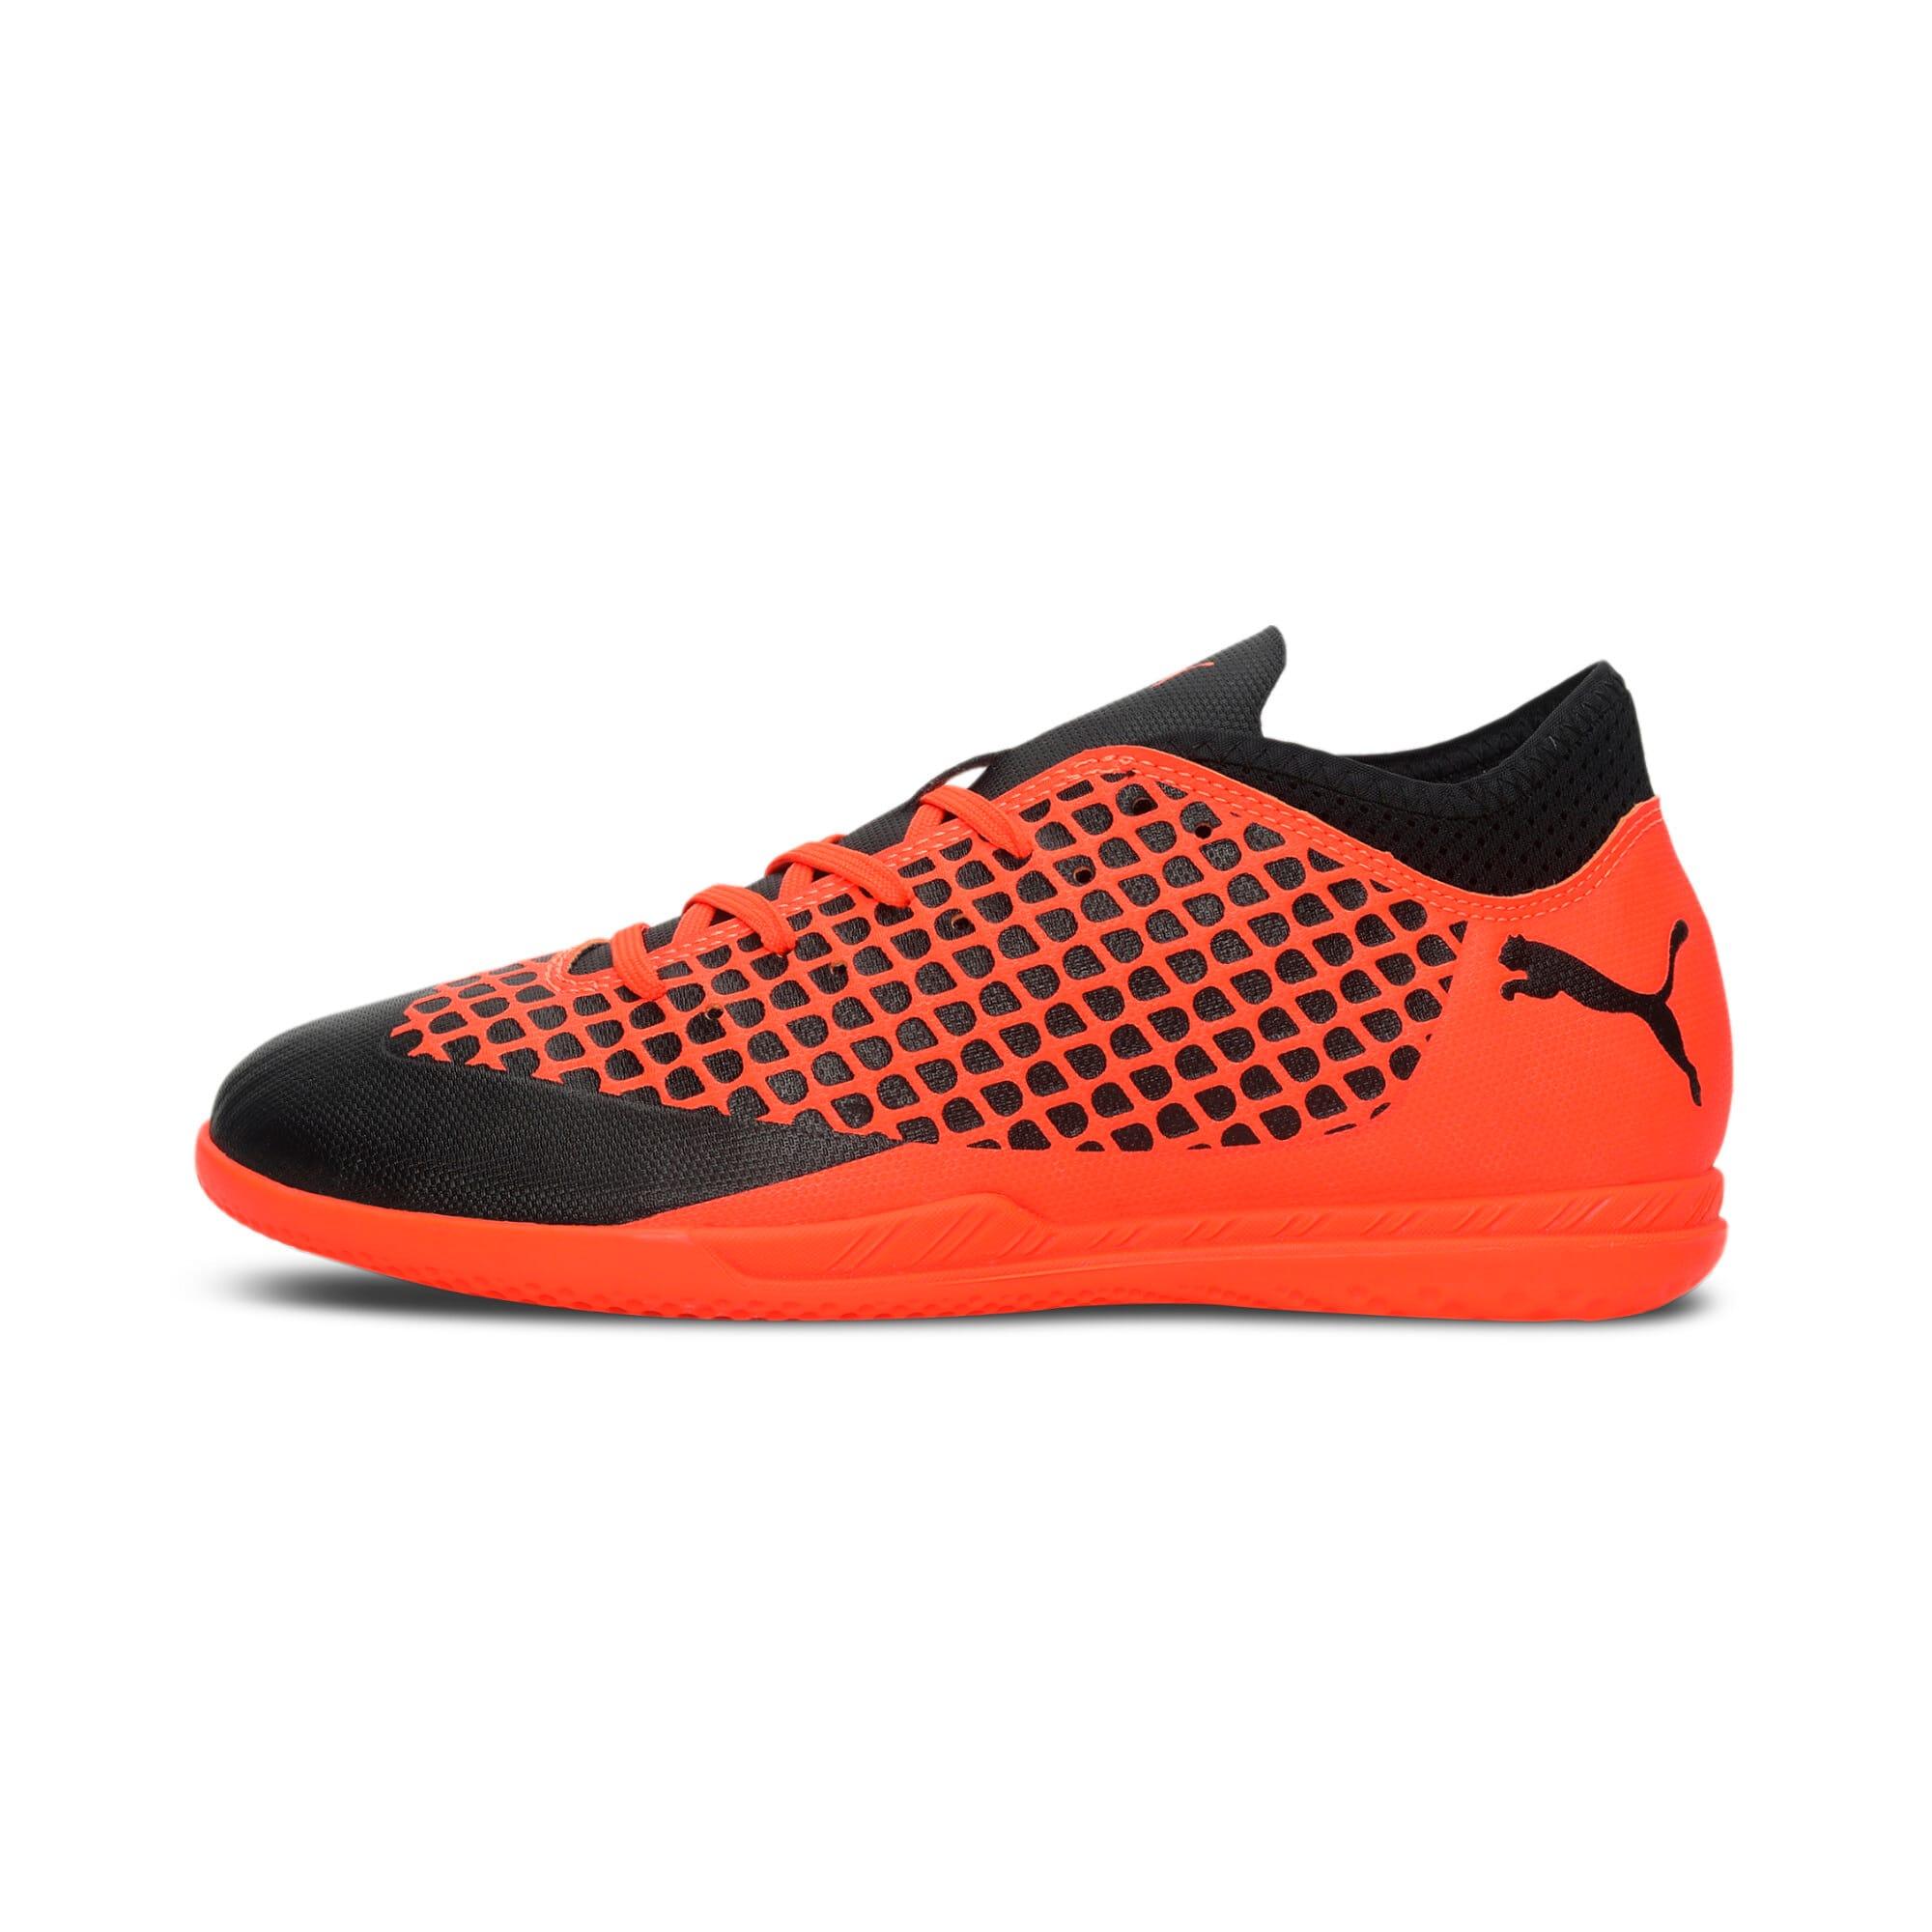 Thumbnail 1 of FUTURE 2.4 IT Kids' Football Shoes, Black-Orange, medium-IND